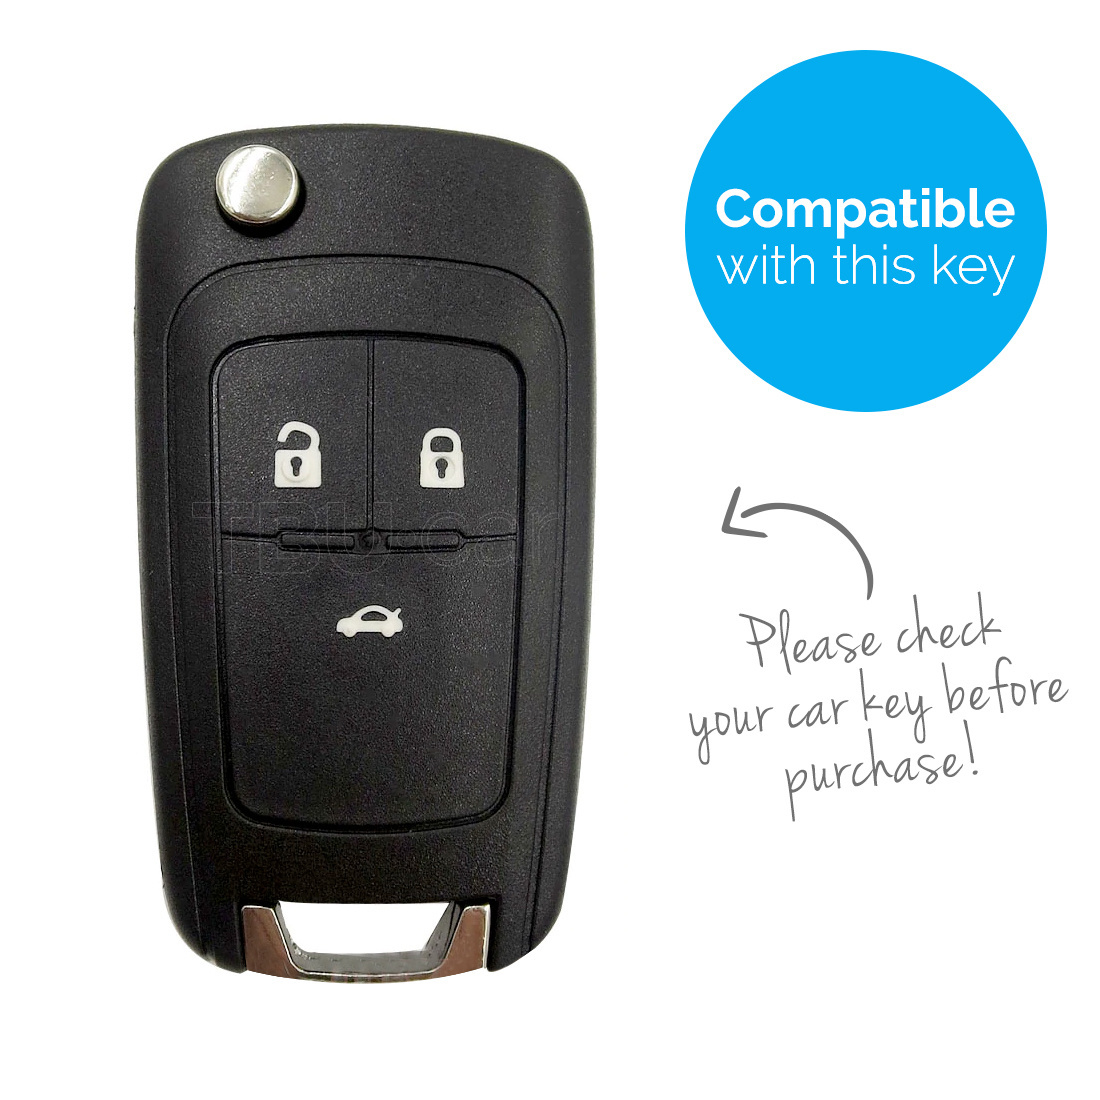 TBU car TBU car Autoschlüssel Hülle kompatibel mit Opel 3 Tasten - Schutzhülle aus Silikon - Auto Schlüsselhülle Cover in Weiß